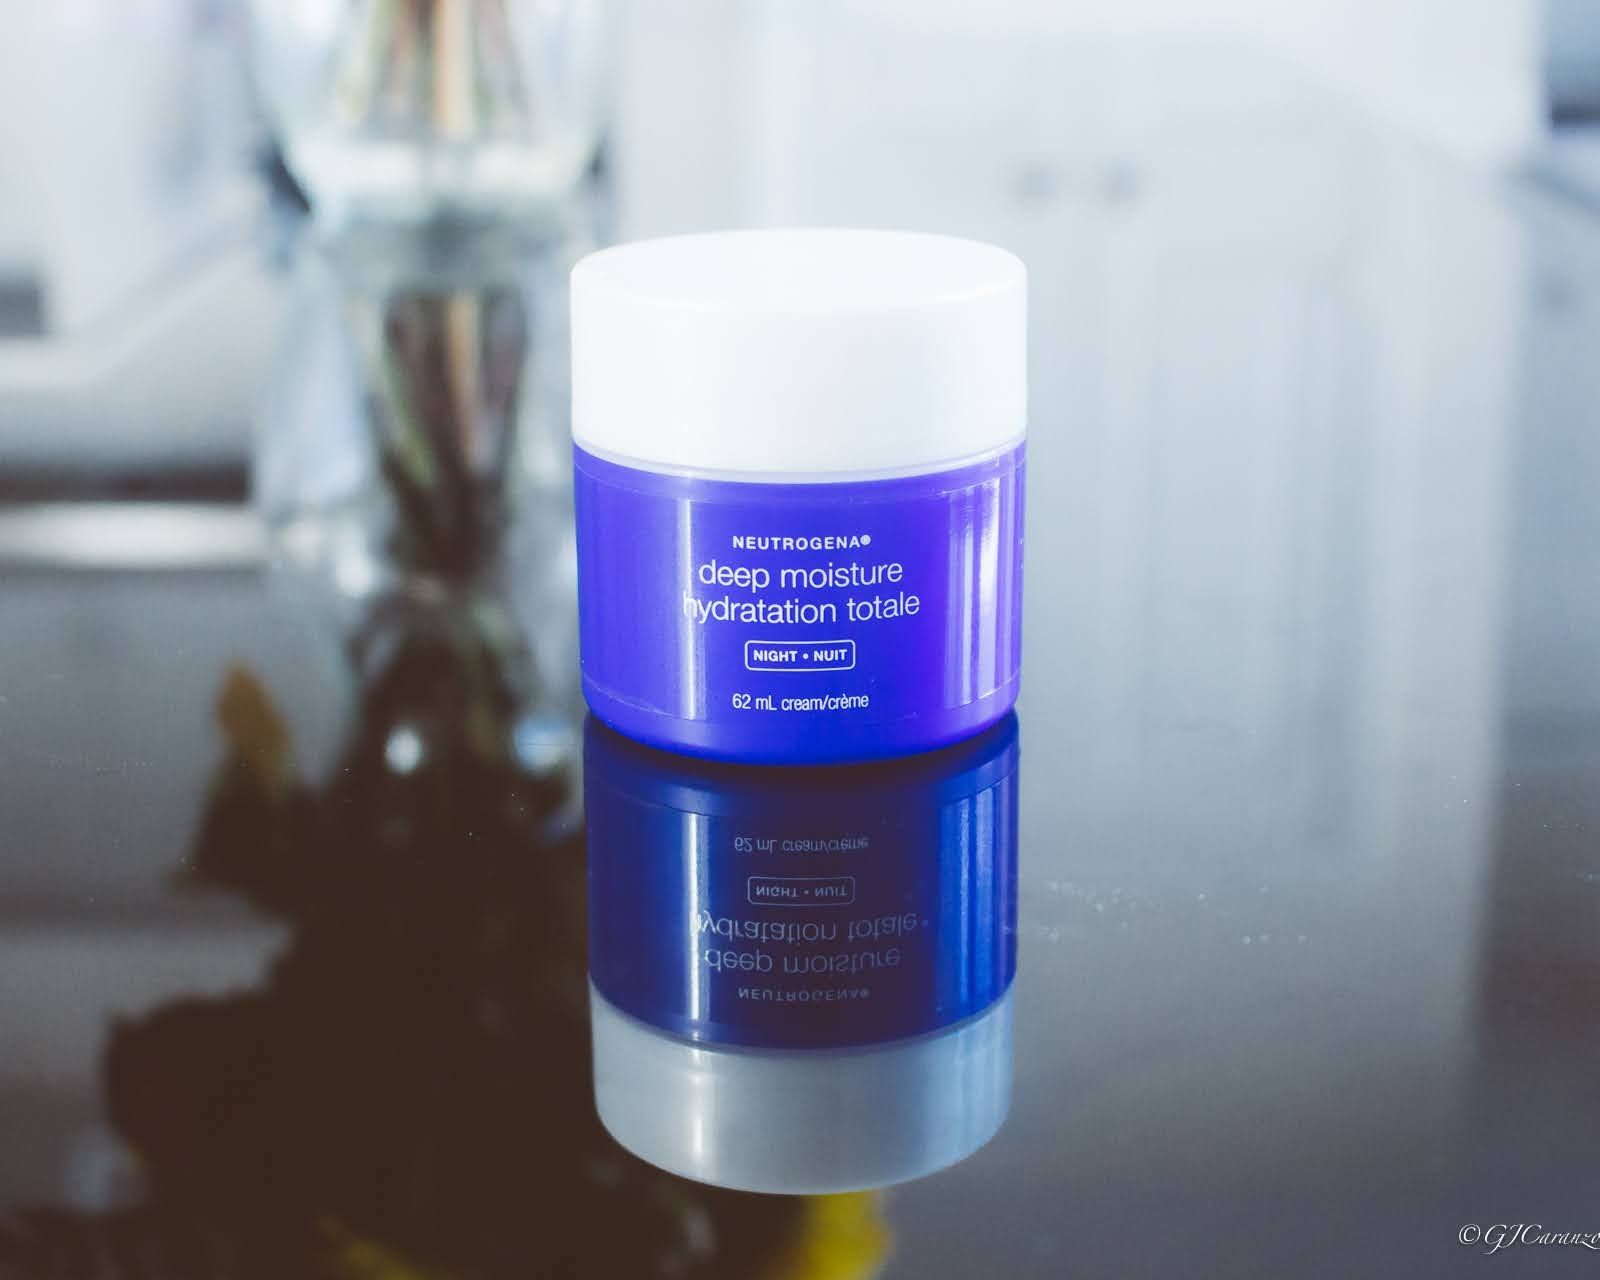 Neutrogena Deep Moisture Hydration Totale Night Cream product review